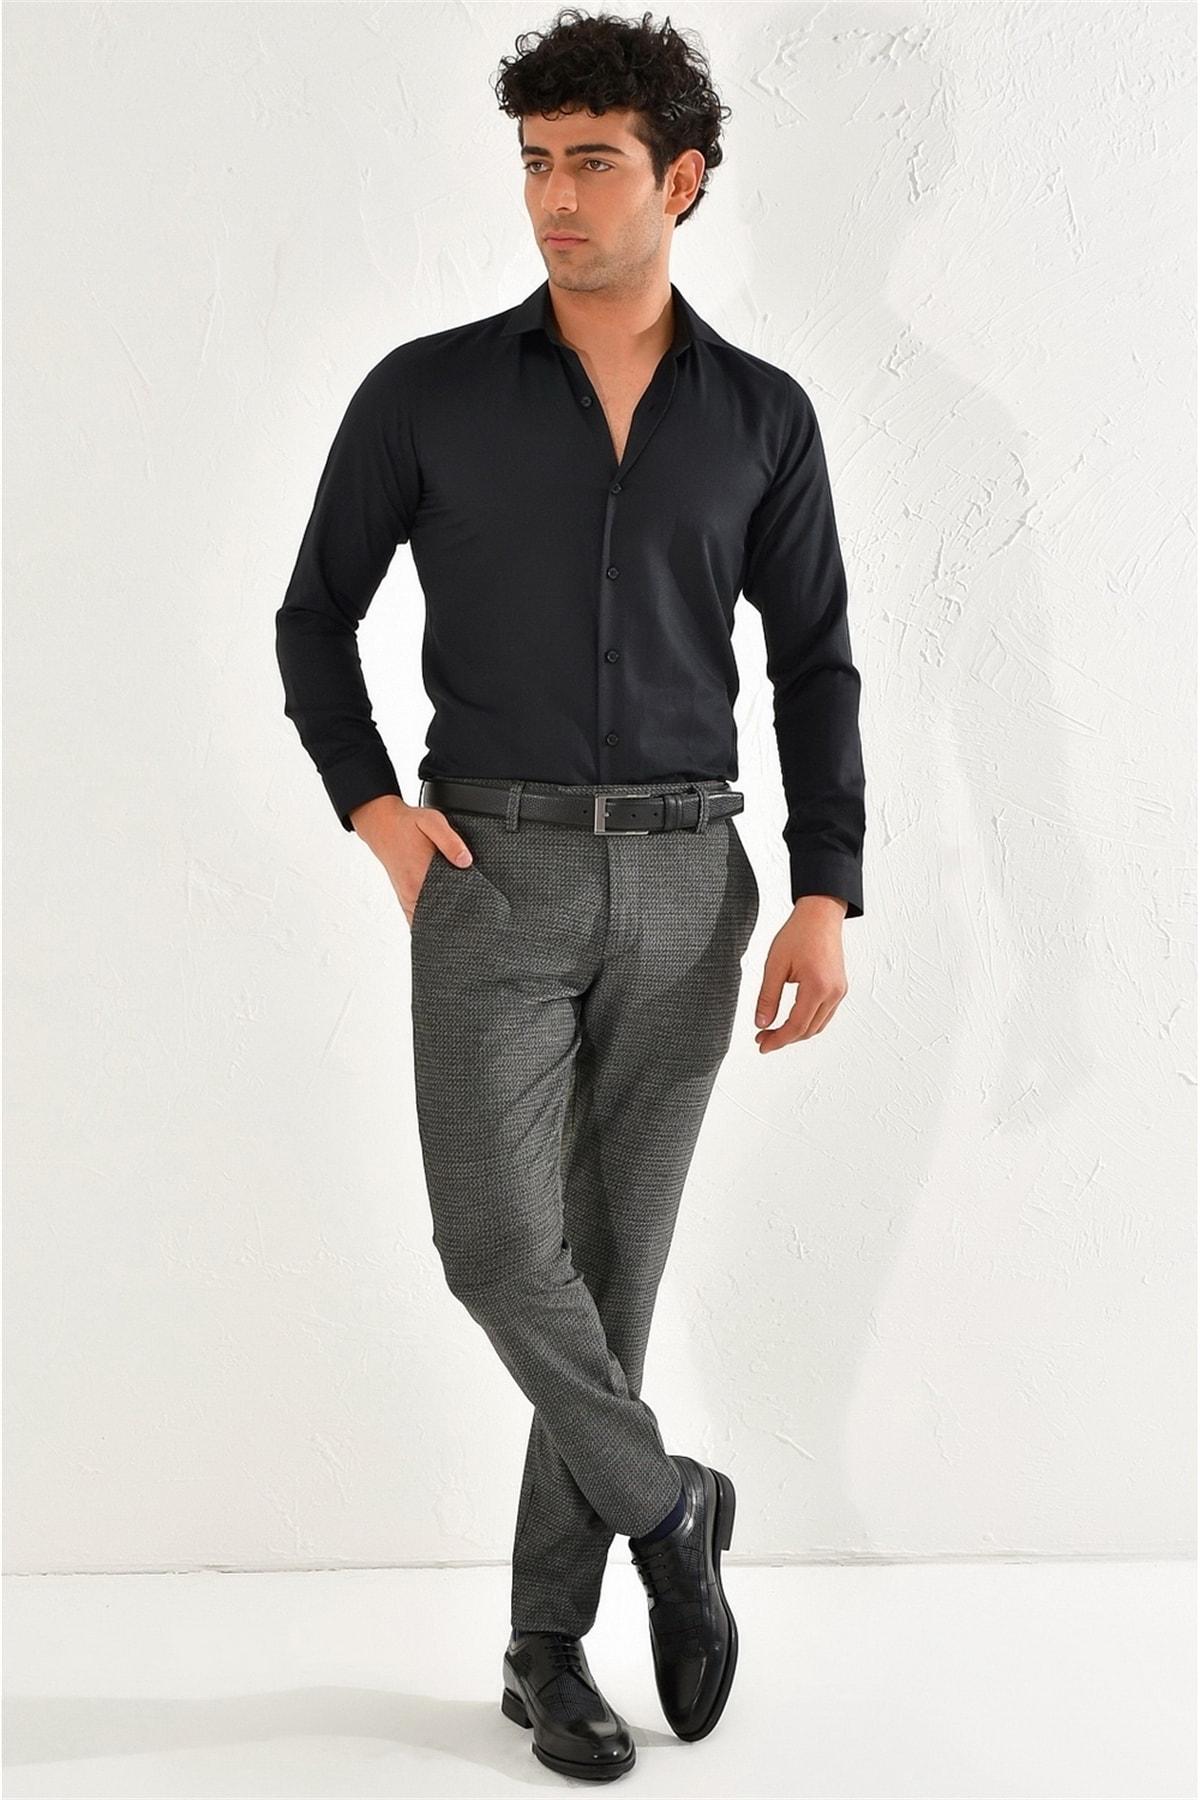 Efor P 1065 Slim Fit Siyah Spor Pantolon 1